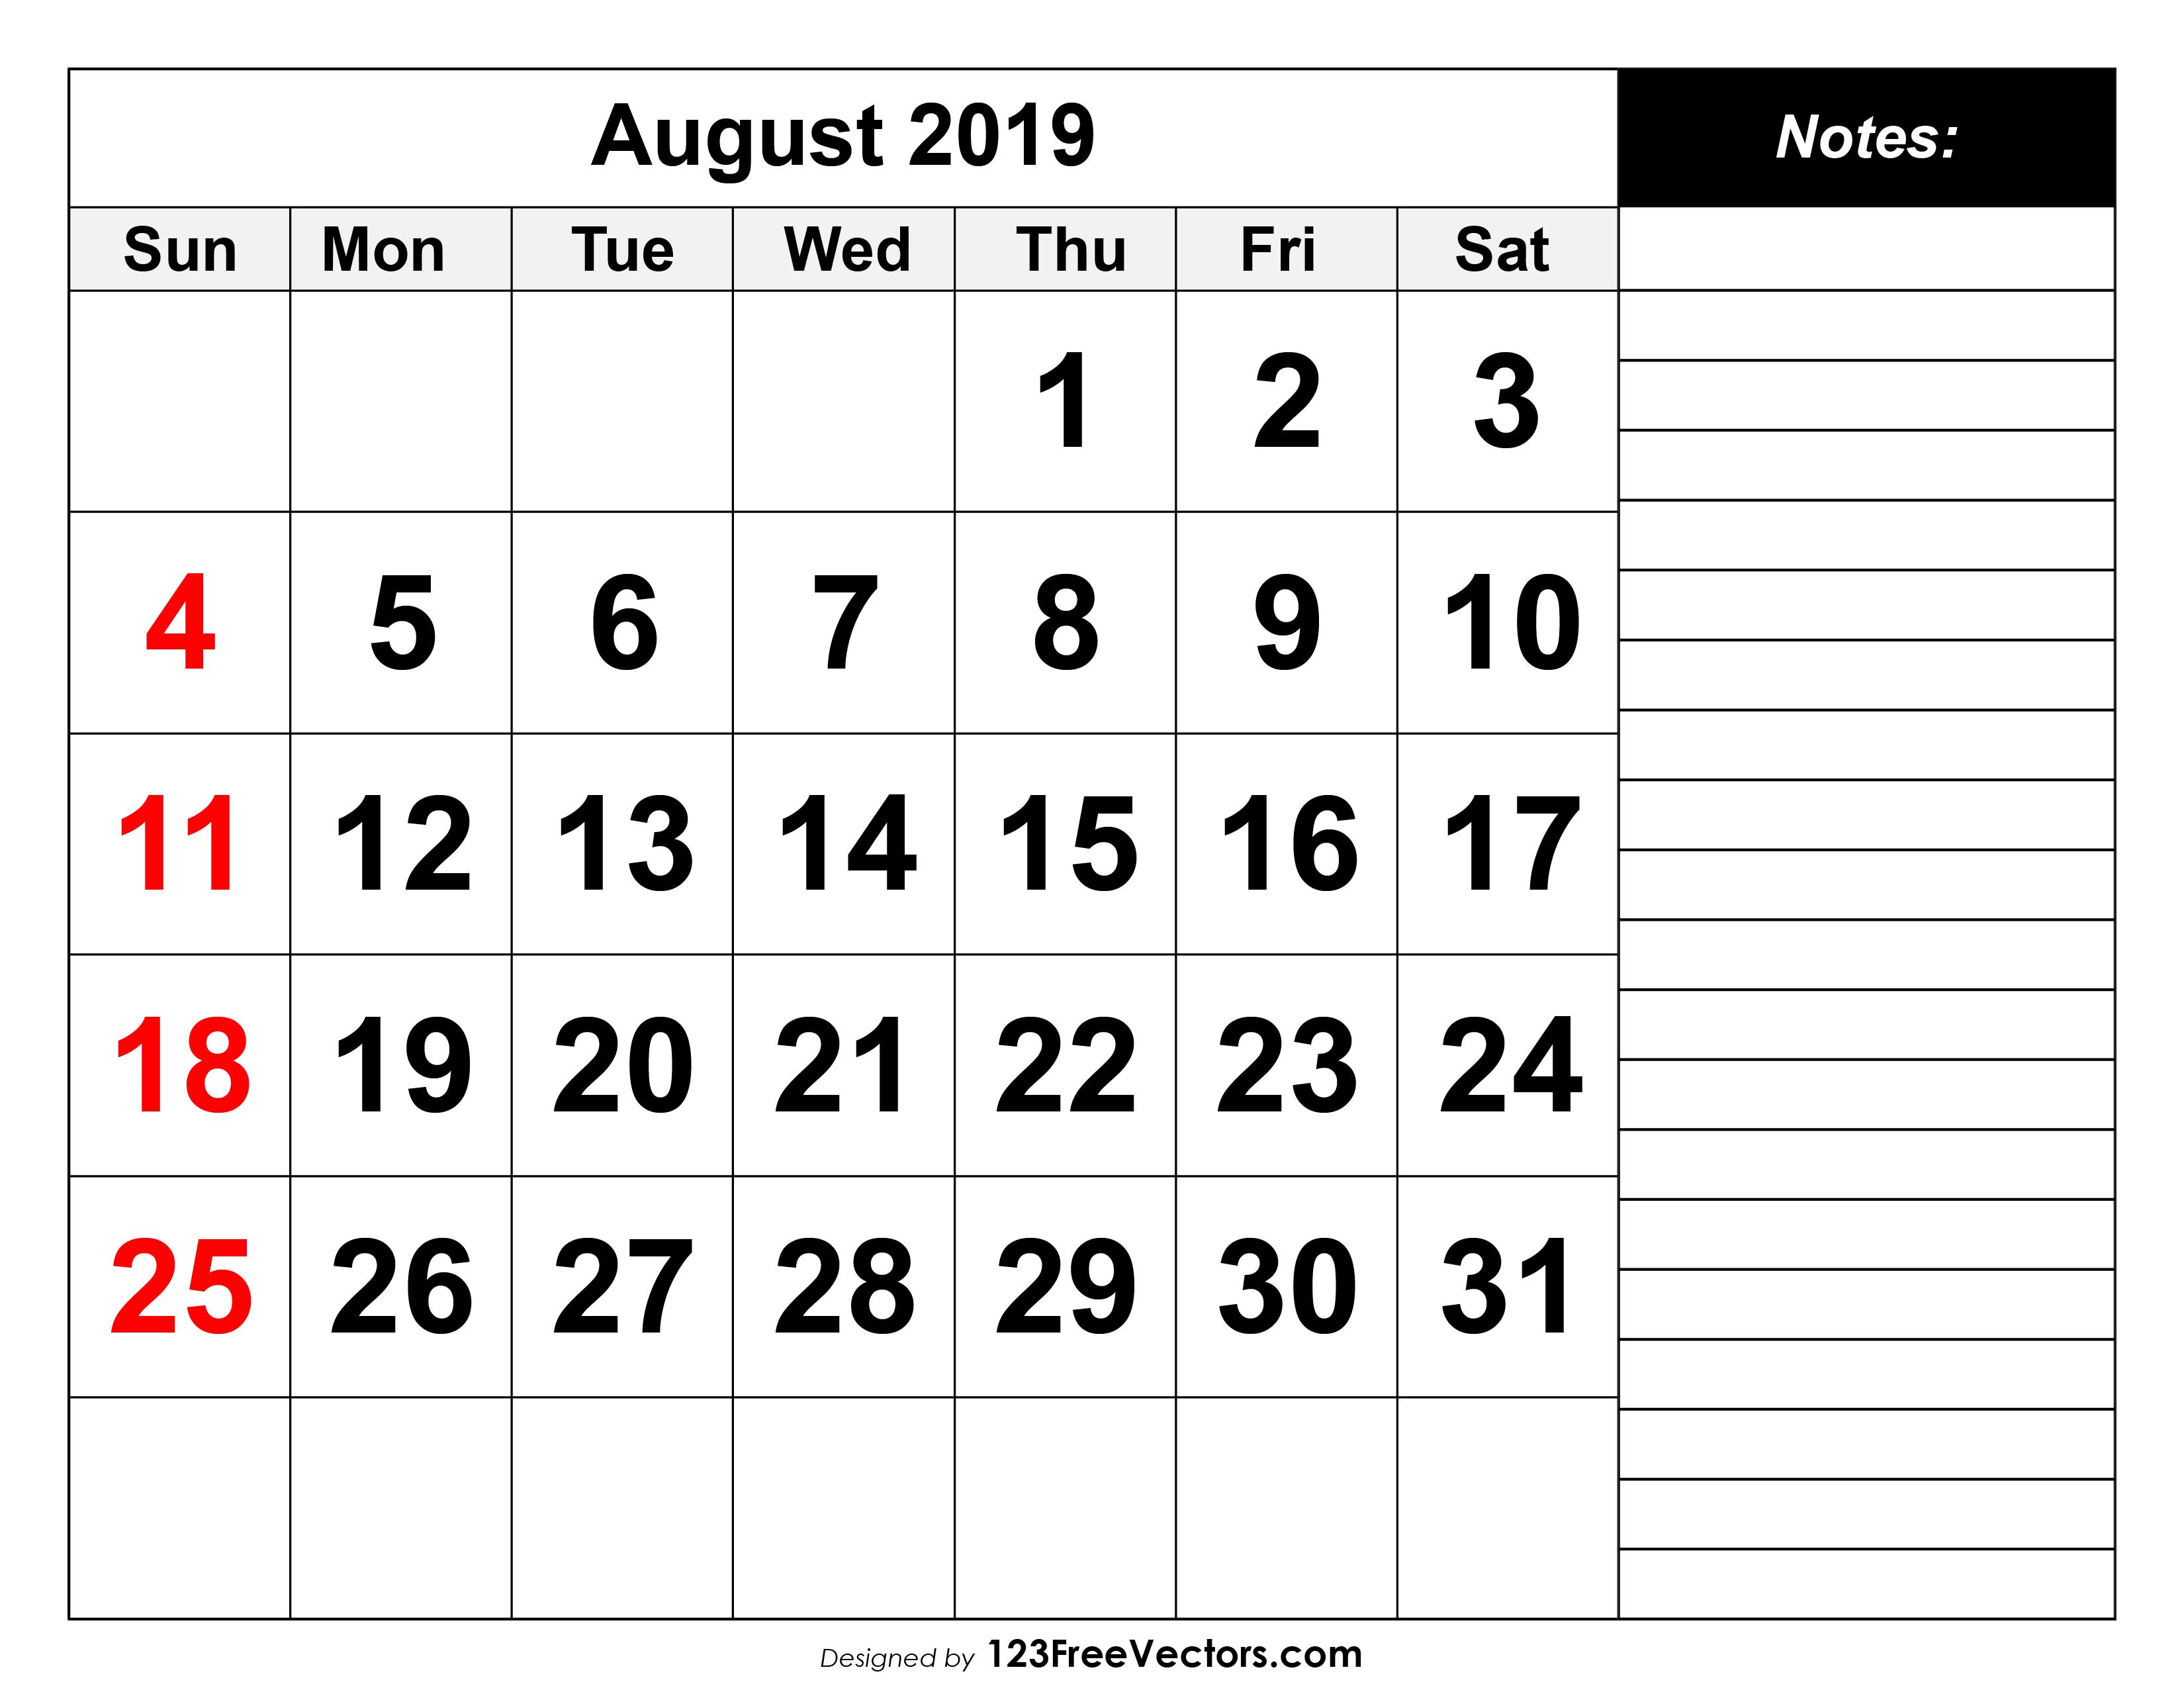 August 2019 Calendar.August 2019 Printable Calendar